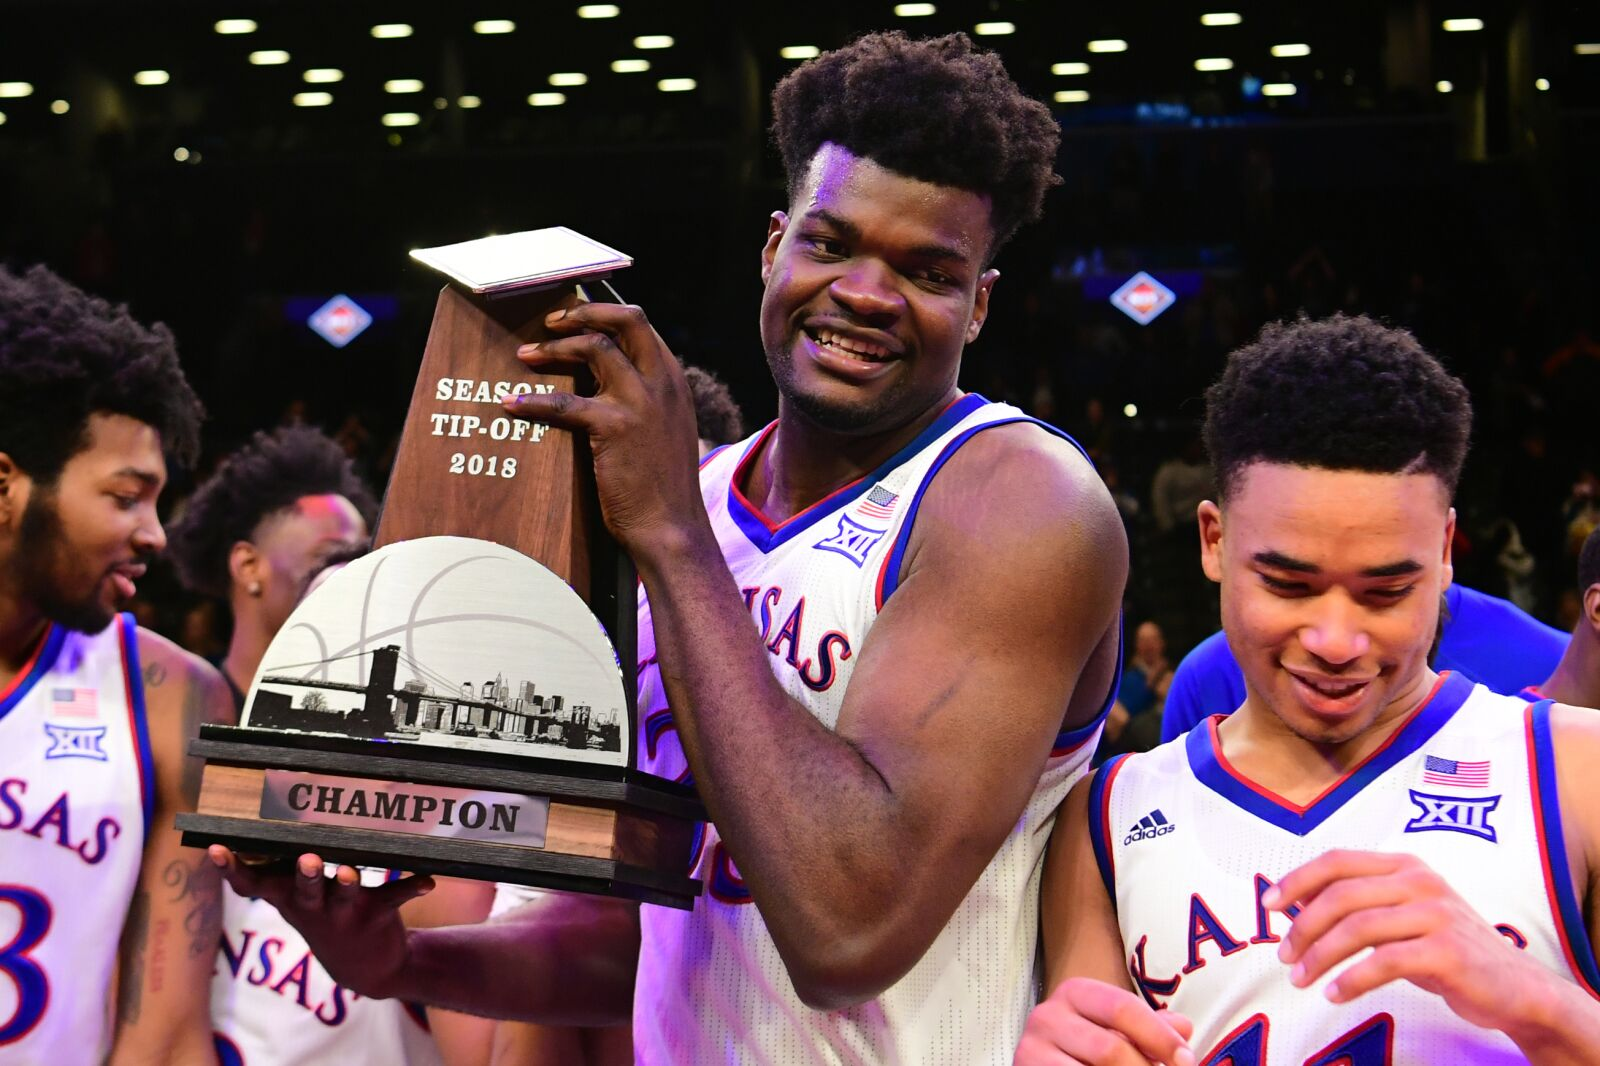 Kansas basketball's Udoka Azubuike and Devon Dotson receive Big 12 preseason honors